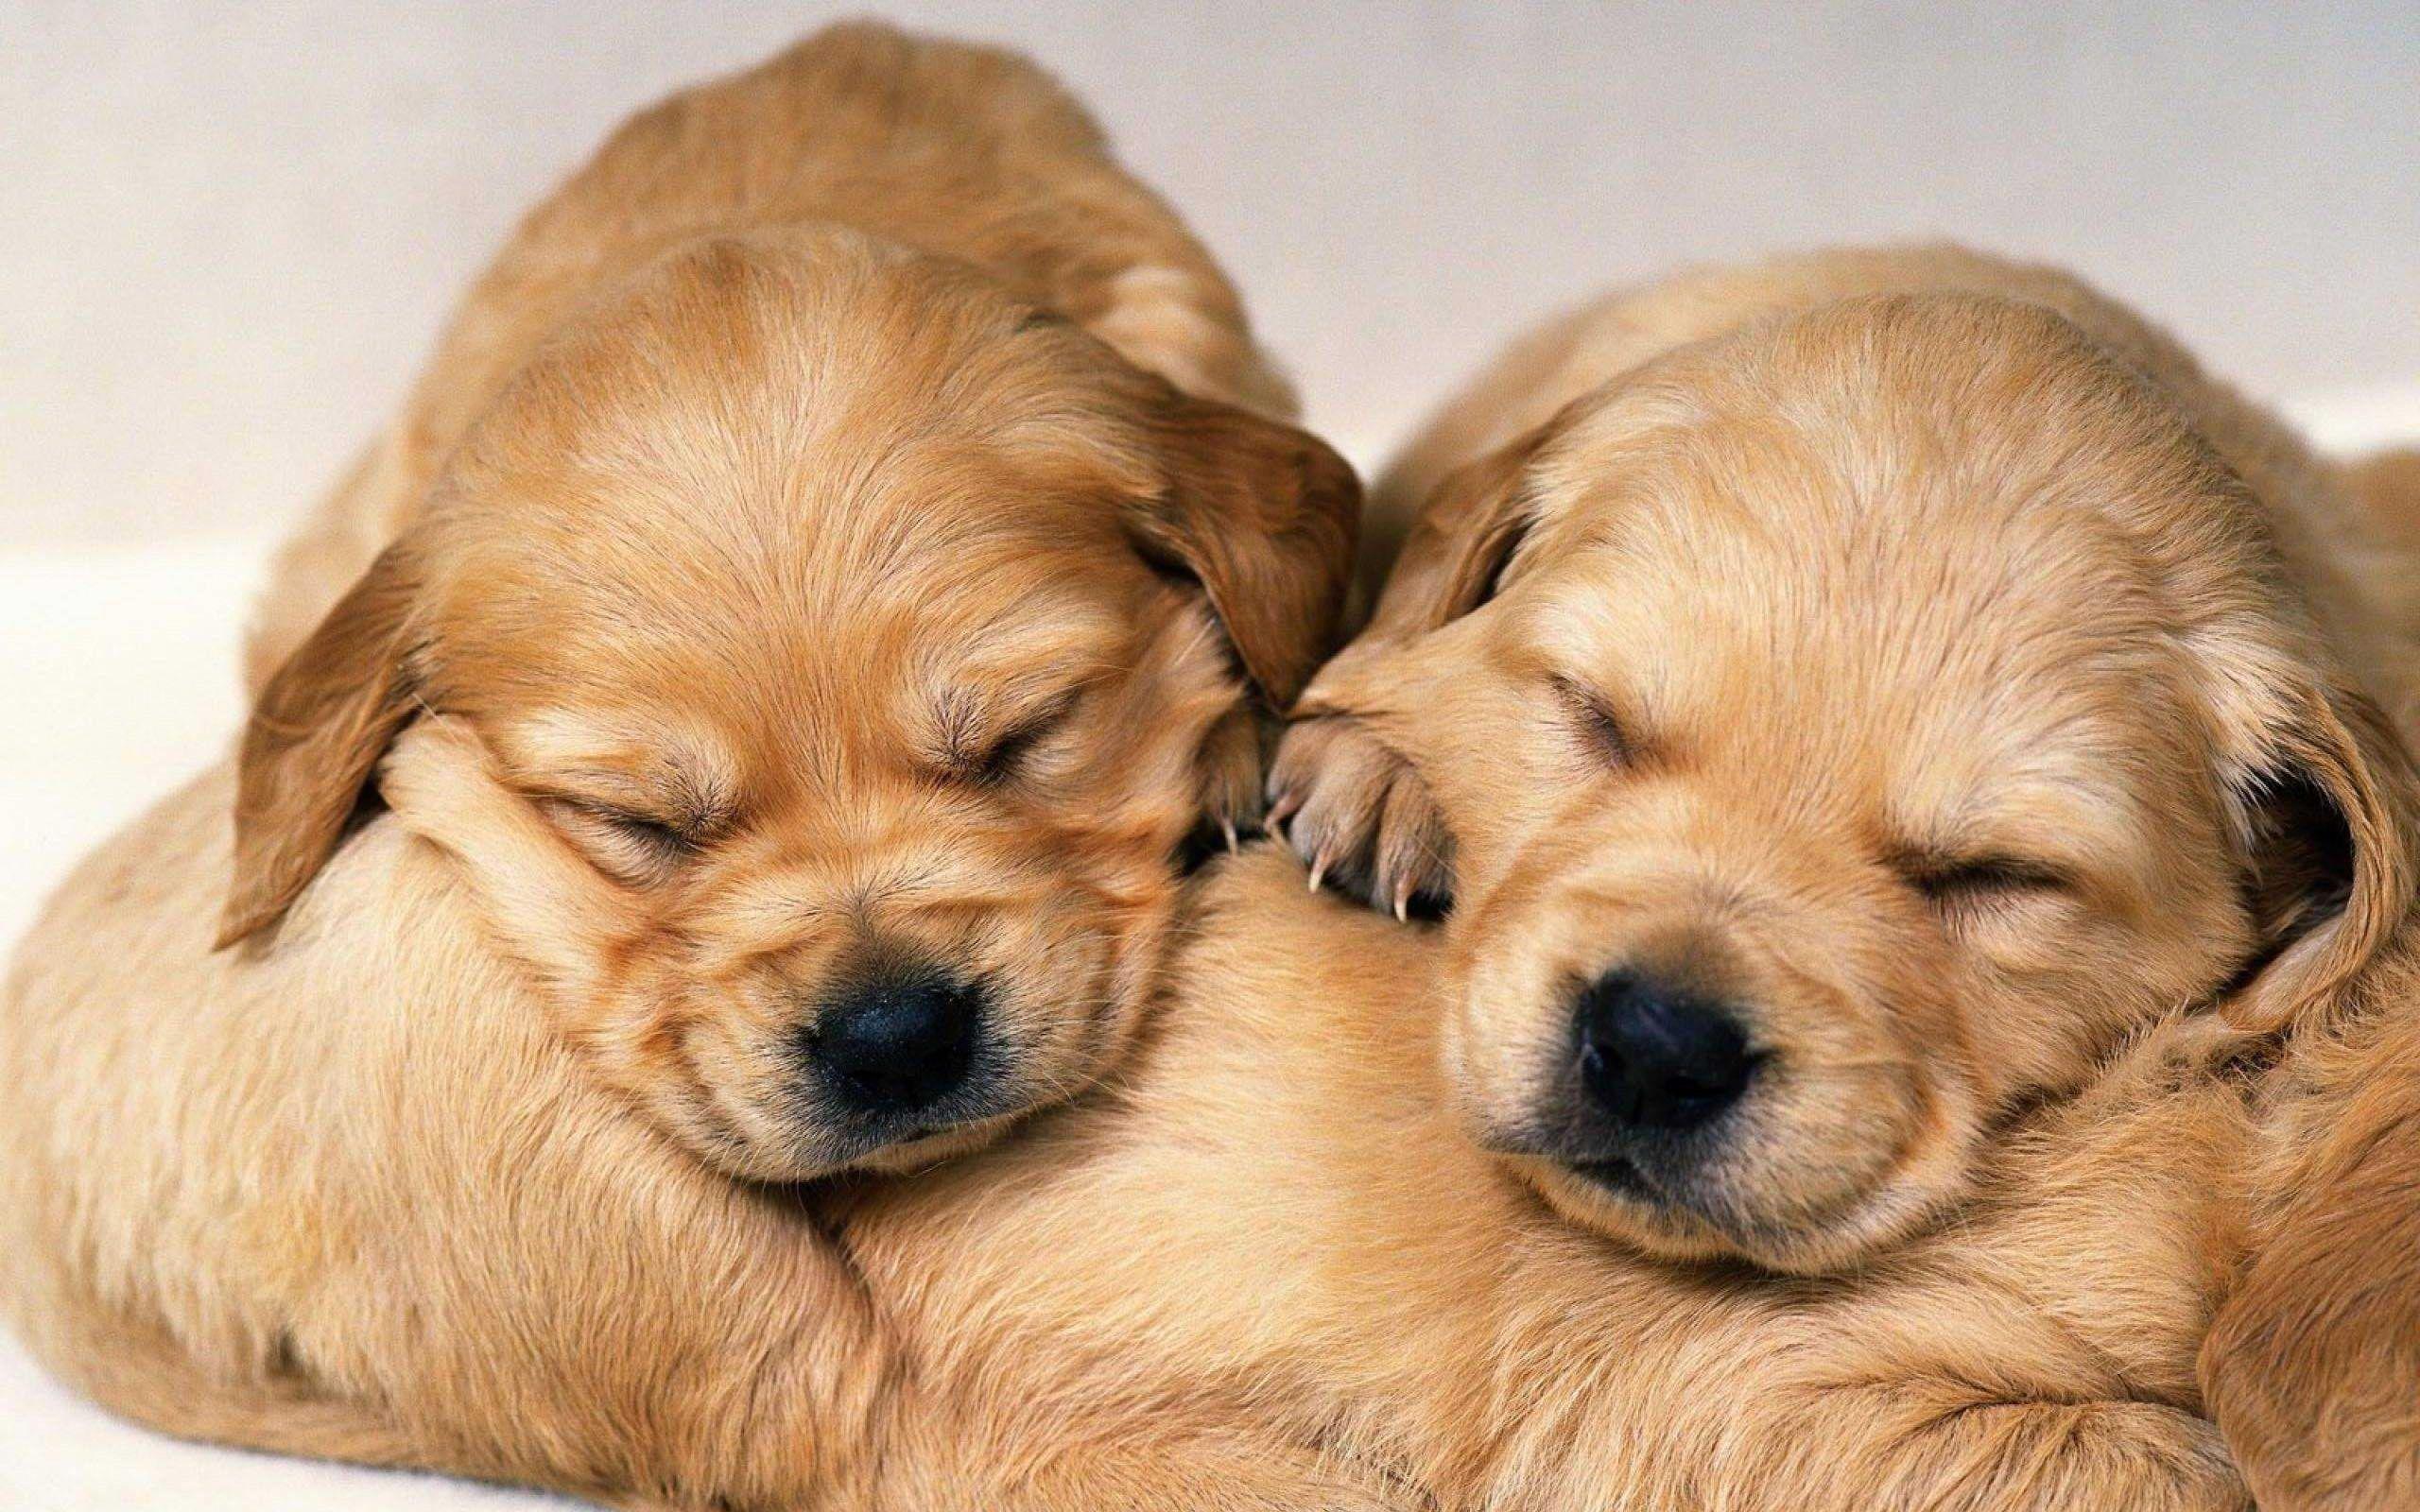 Cute Three Little White Puppies Sleeping To her Sleepy Puppy